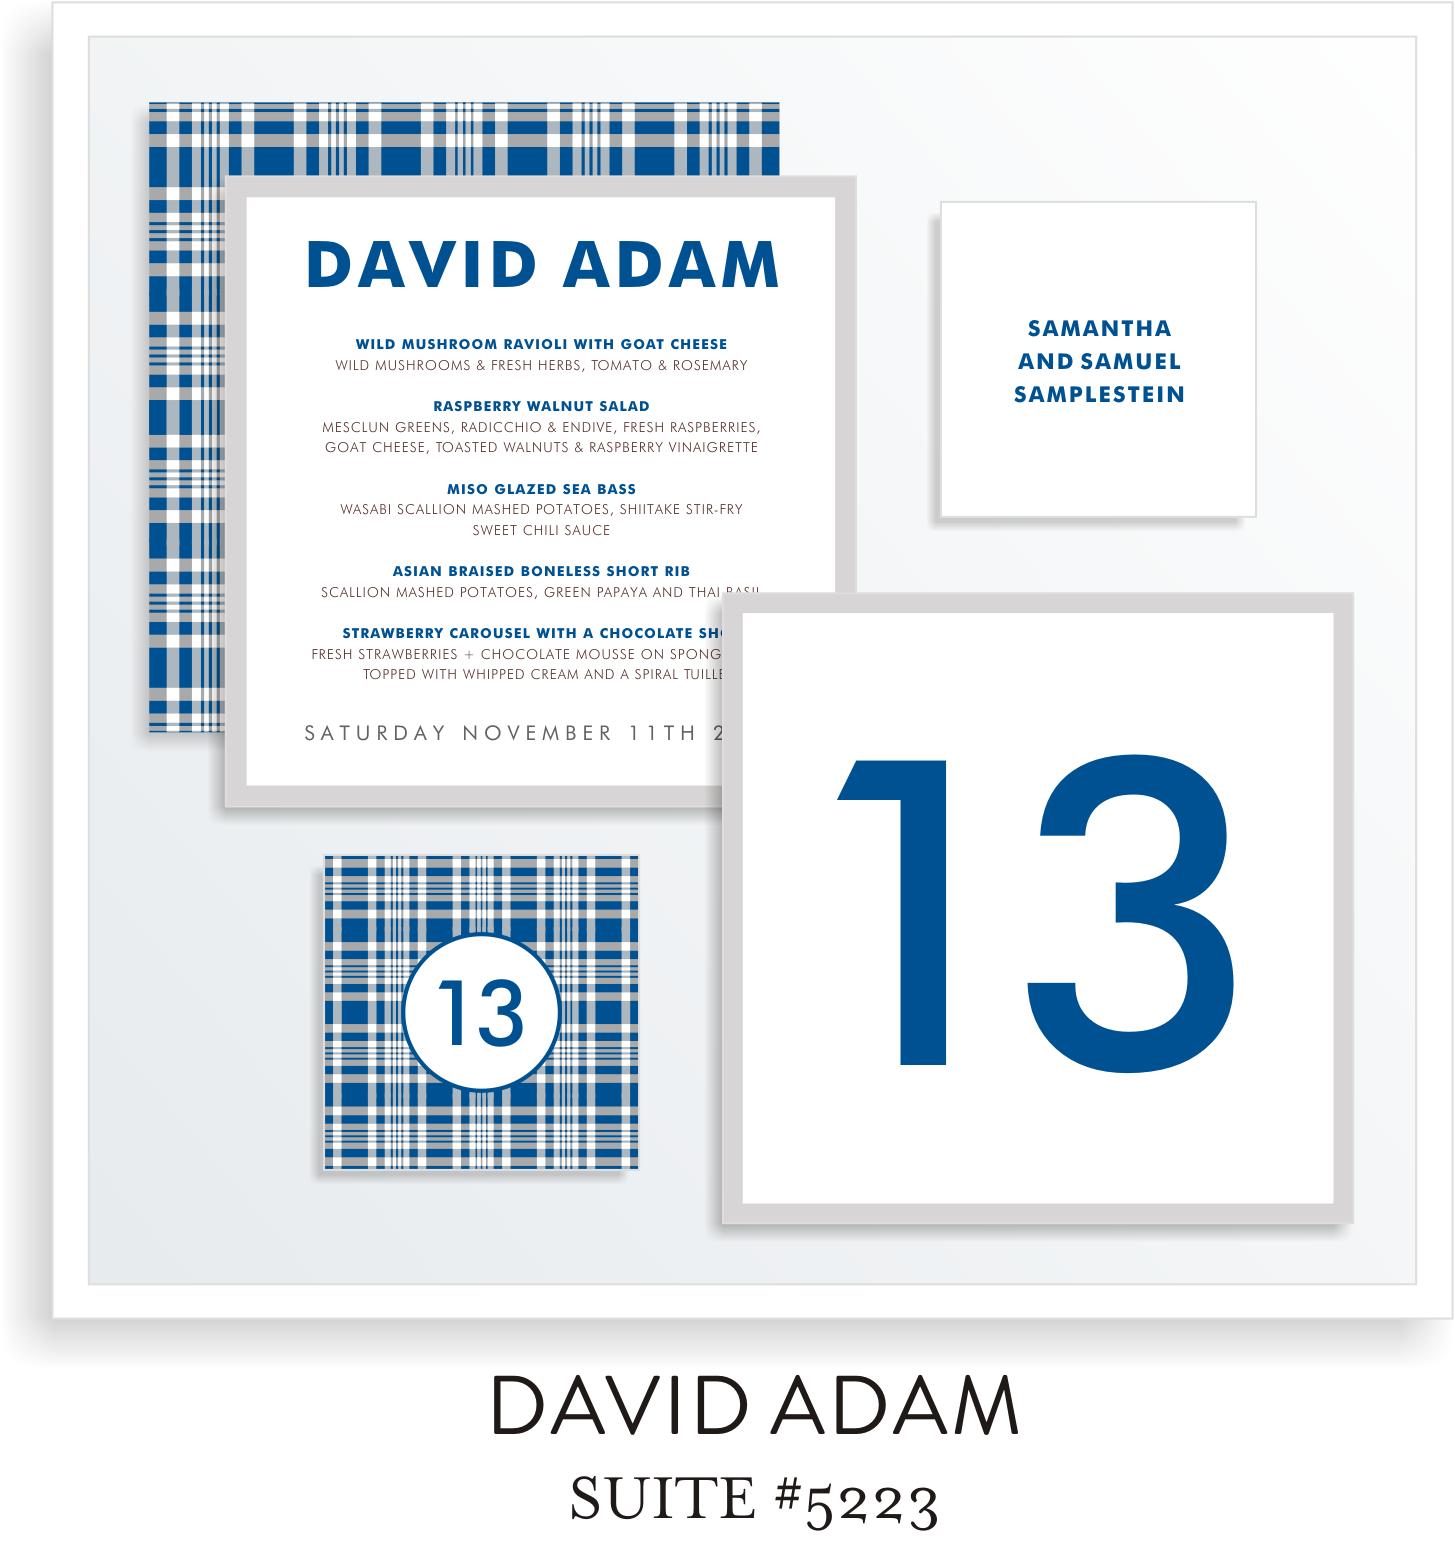 Table Top Decor Suite 5223 - David Adam